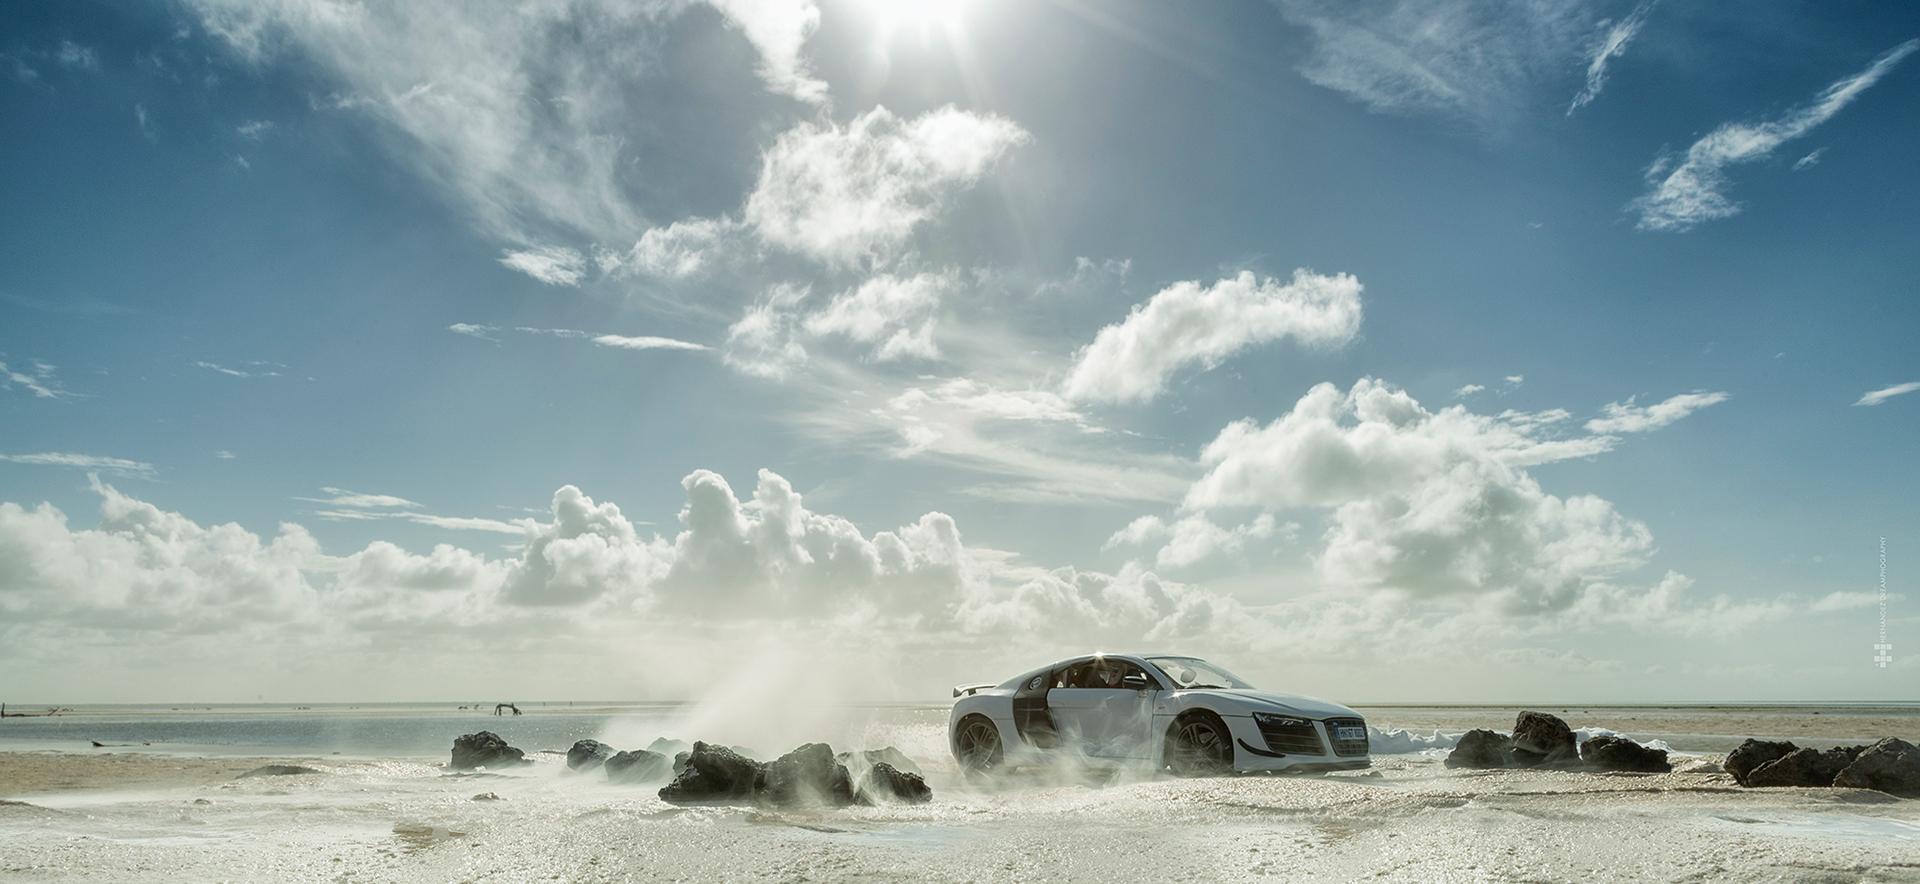 Audi R8 - Miniature Scale Model Car Photography (3)